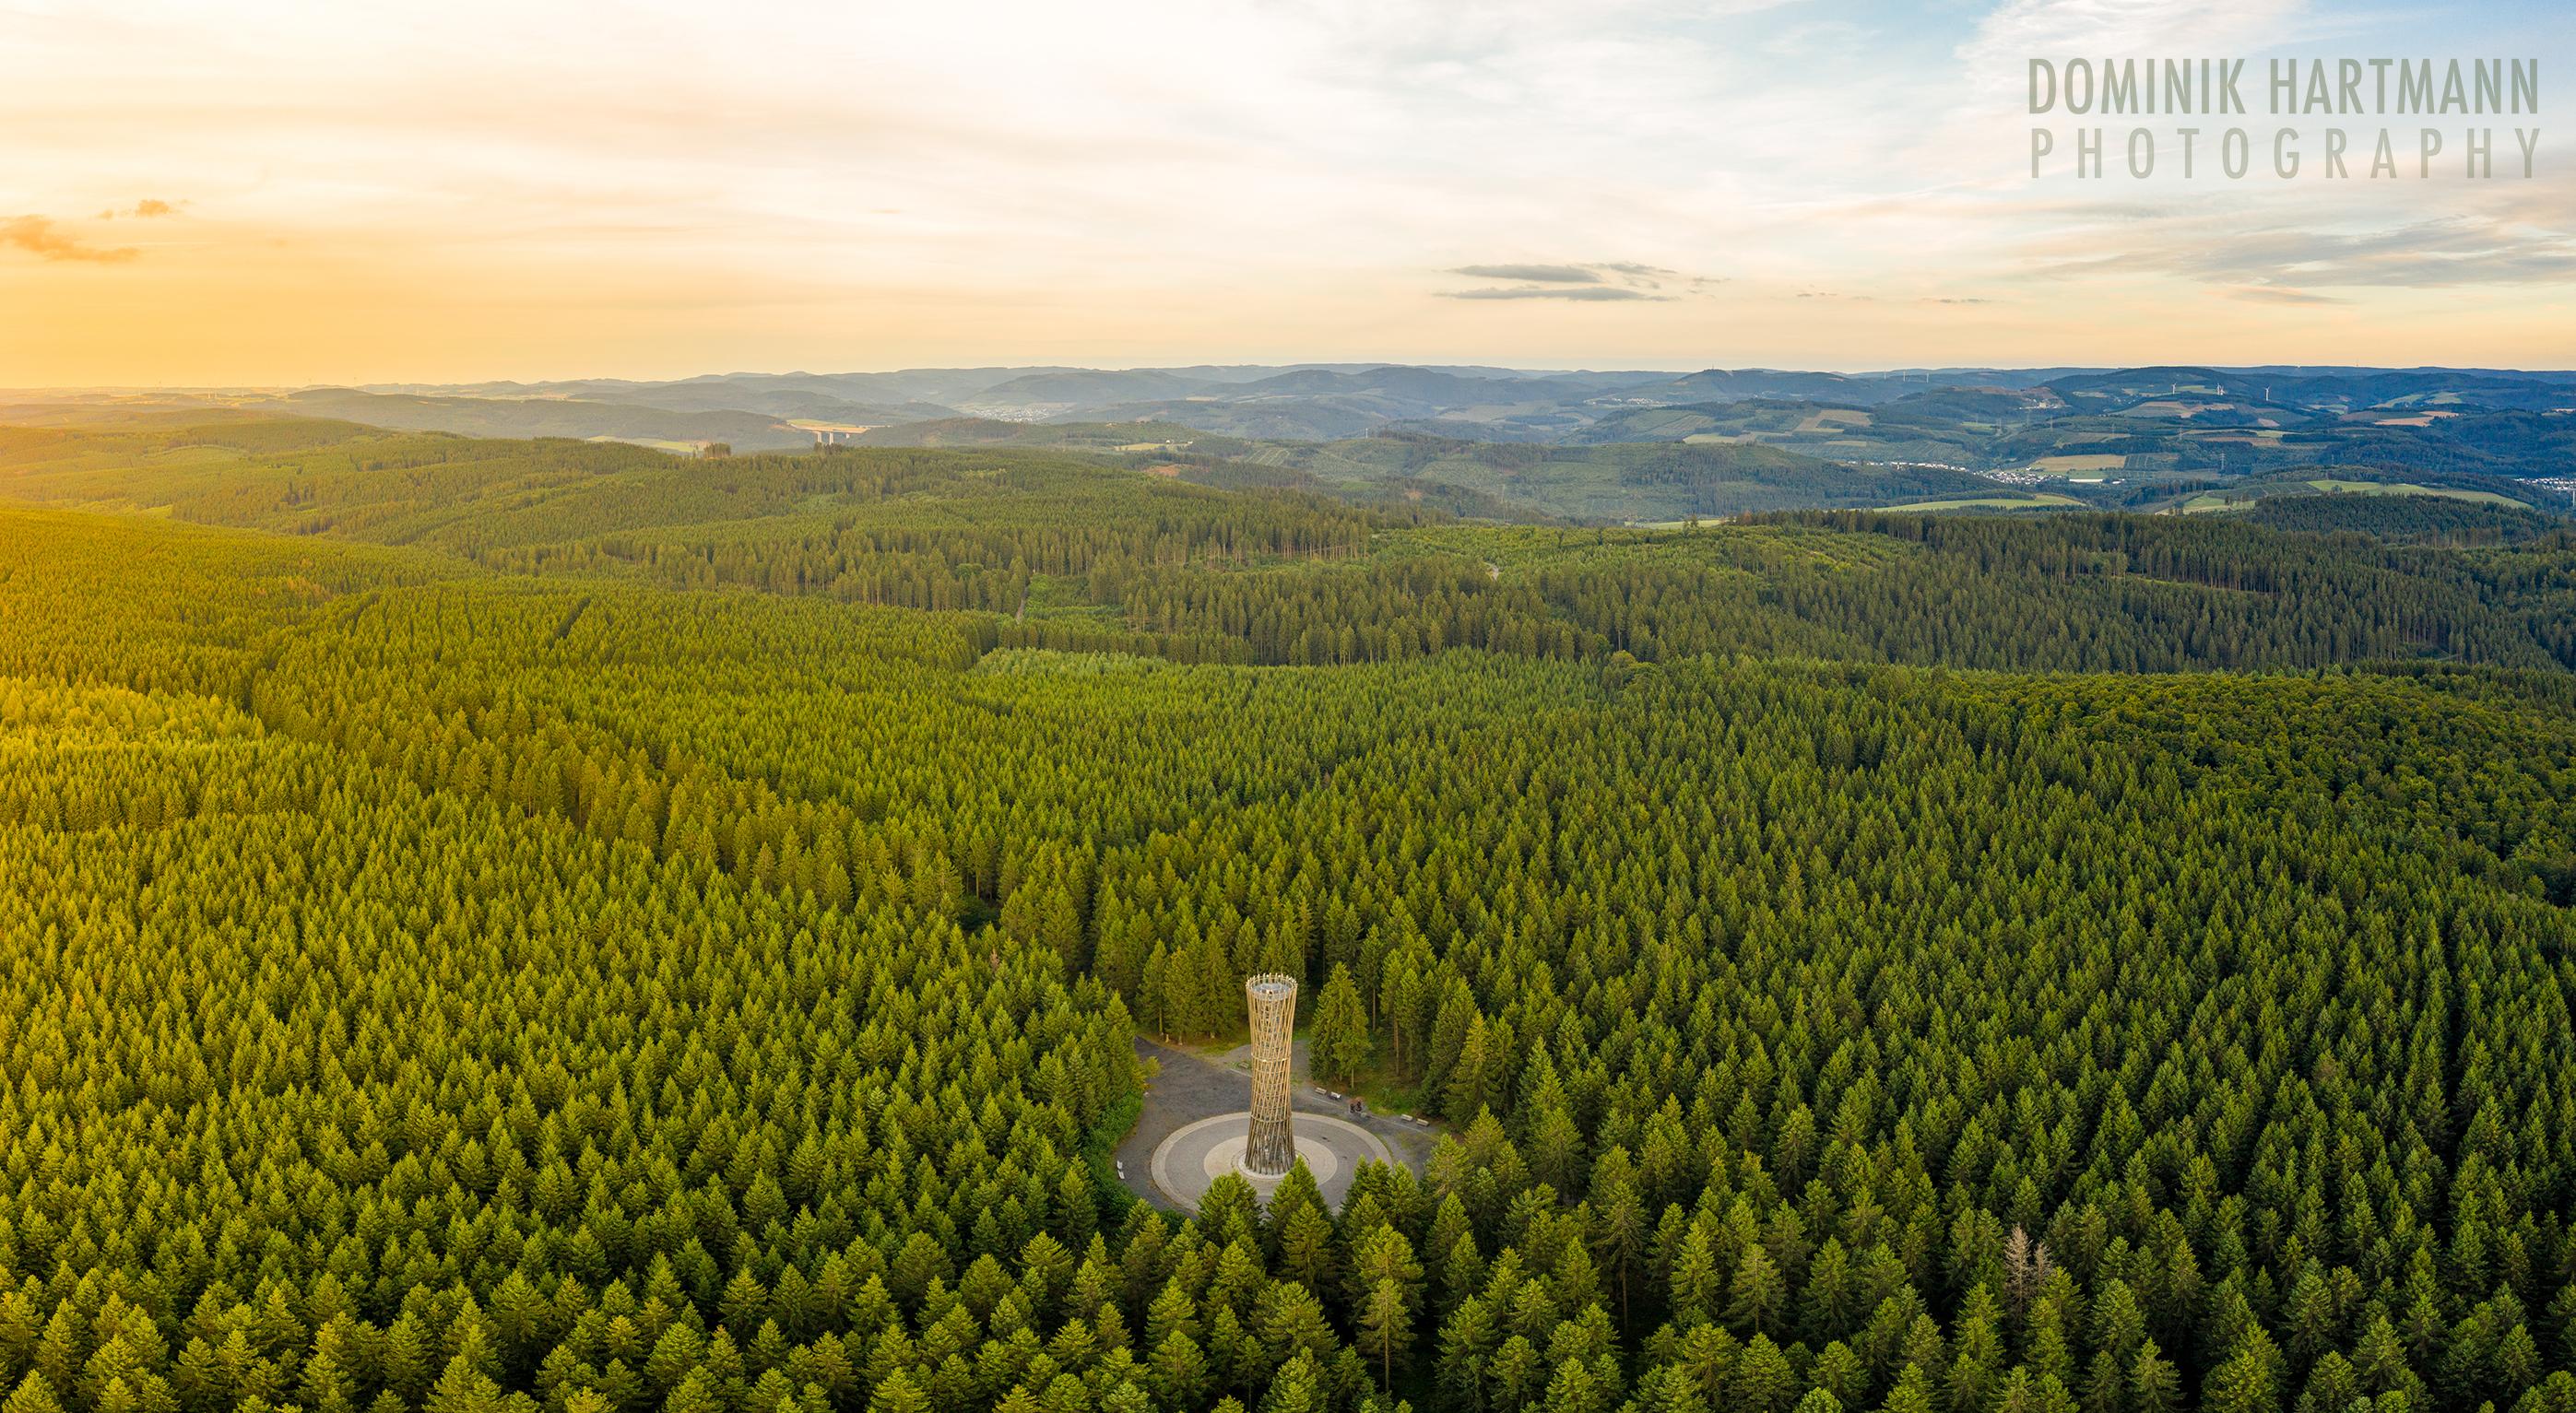 Dominik Hartmann Lörmecke Turm